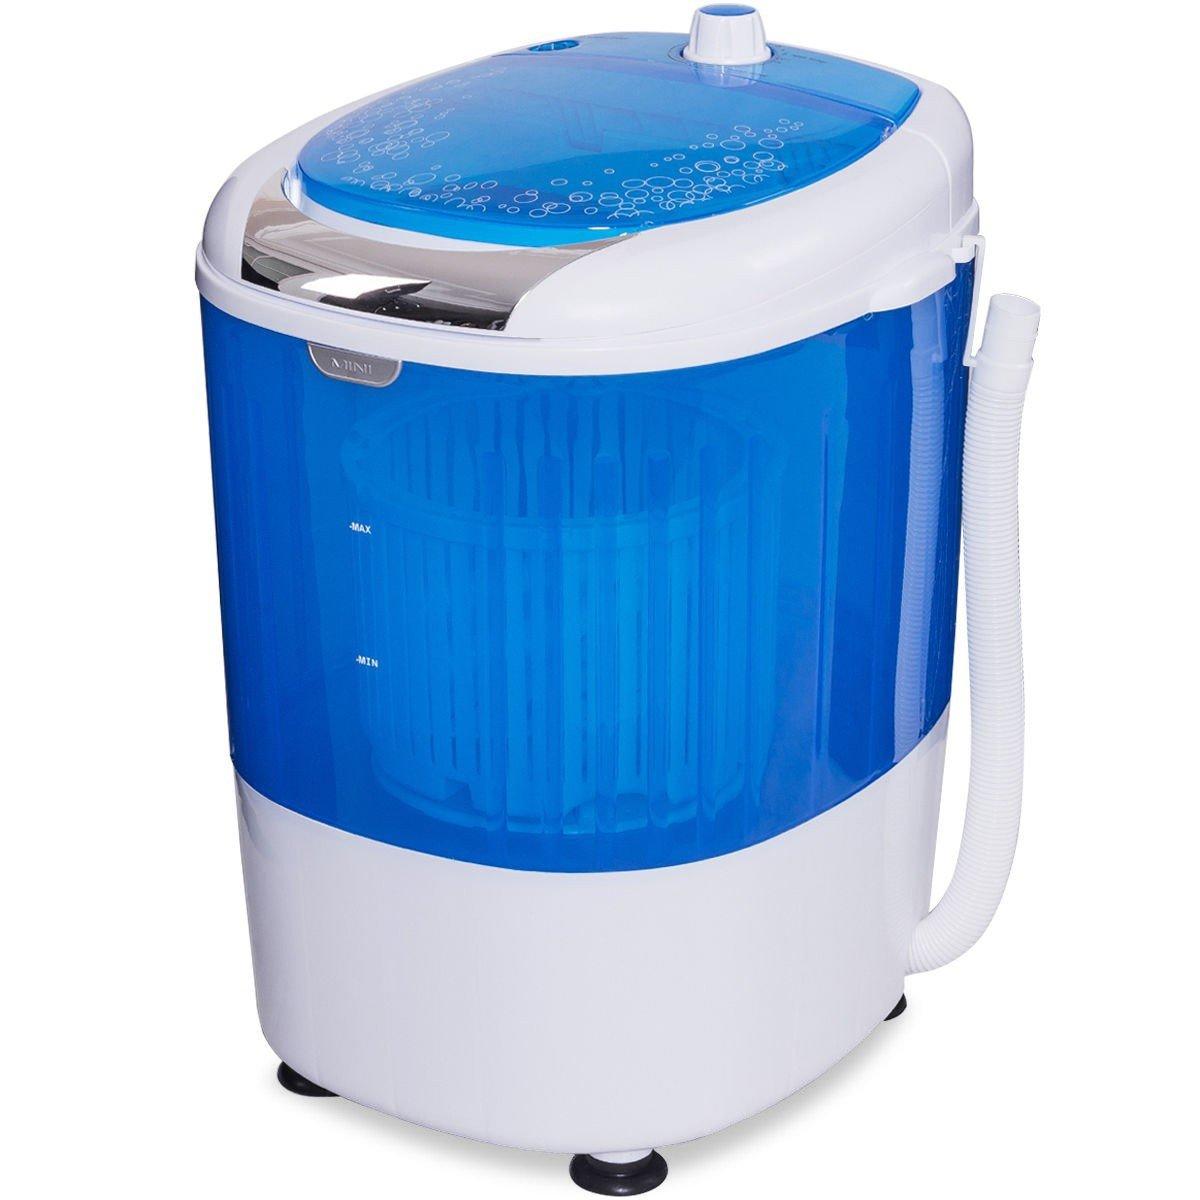 Washing Machine, 5.5 lbs Portable Mini Semi Auto Washing Machine by MD Group (Image #8)